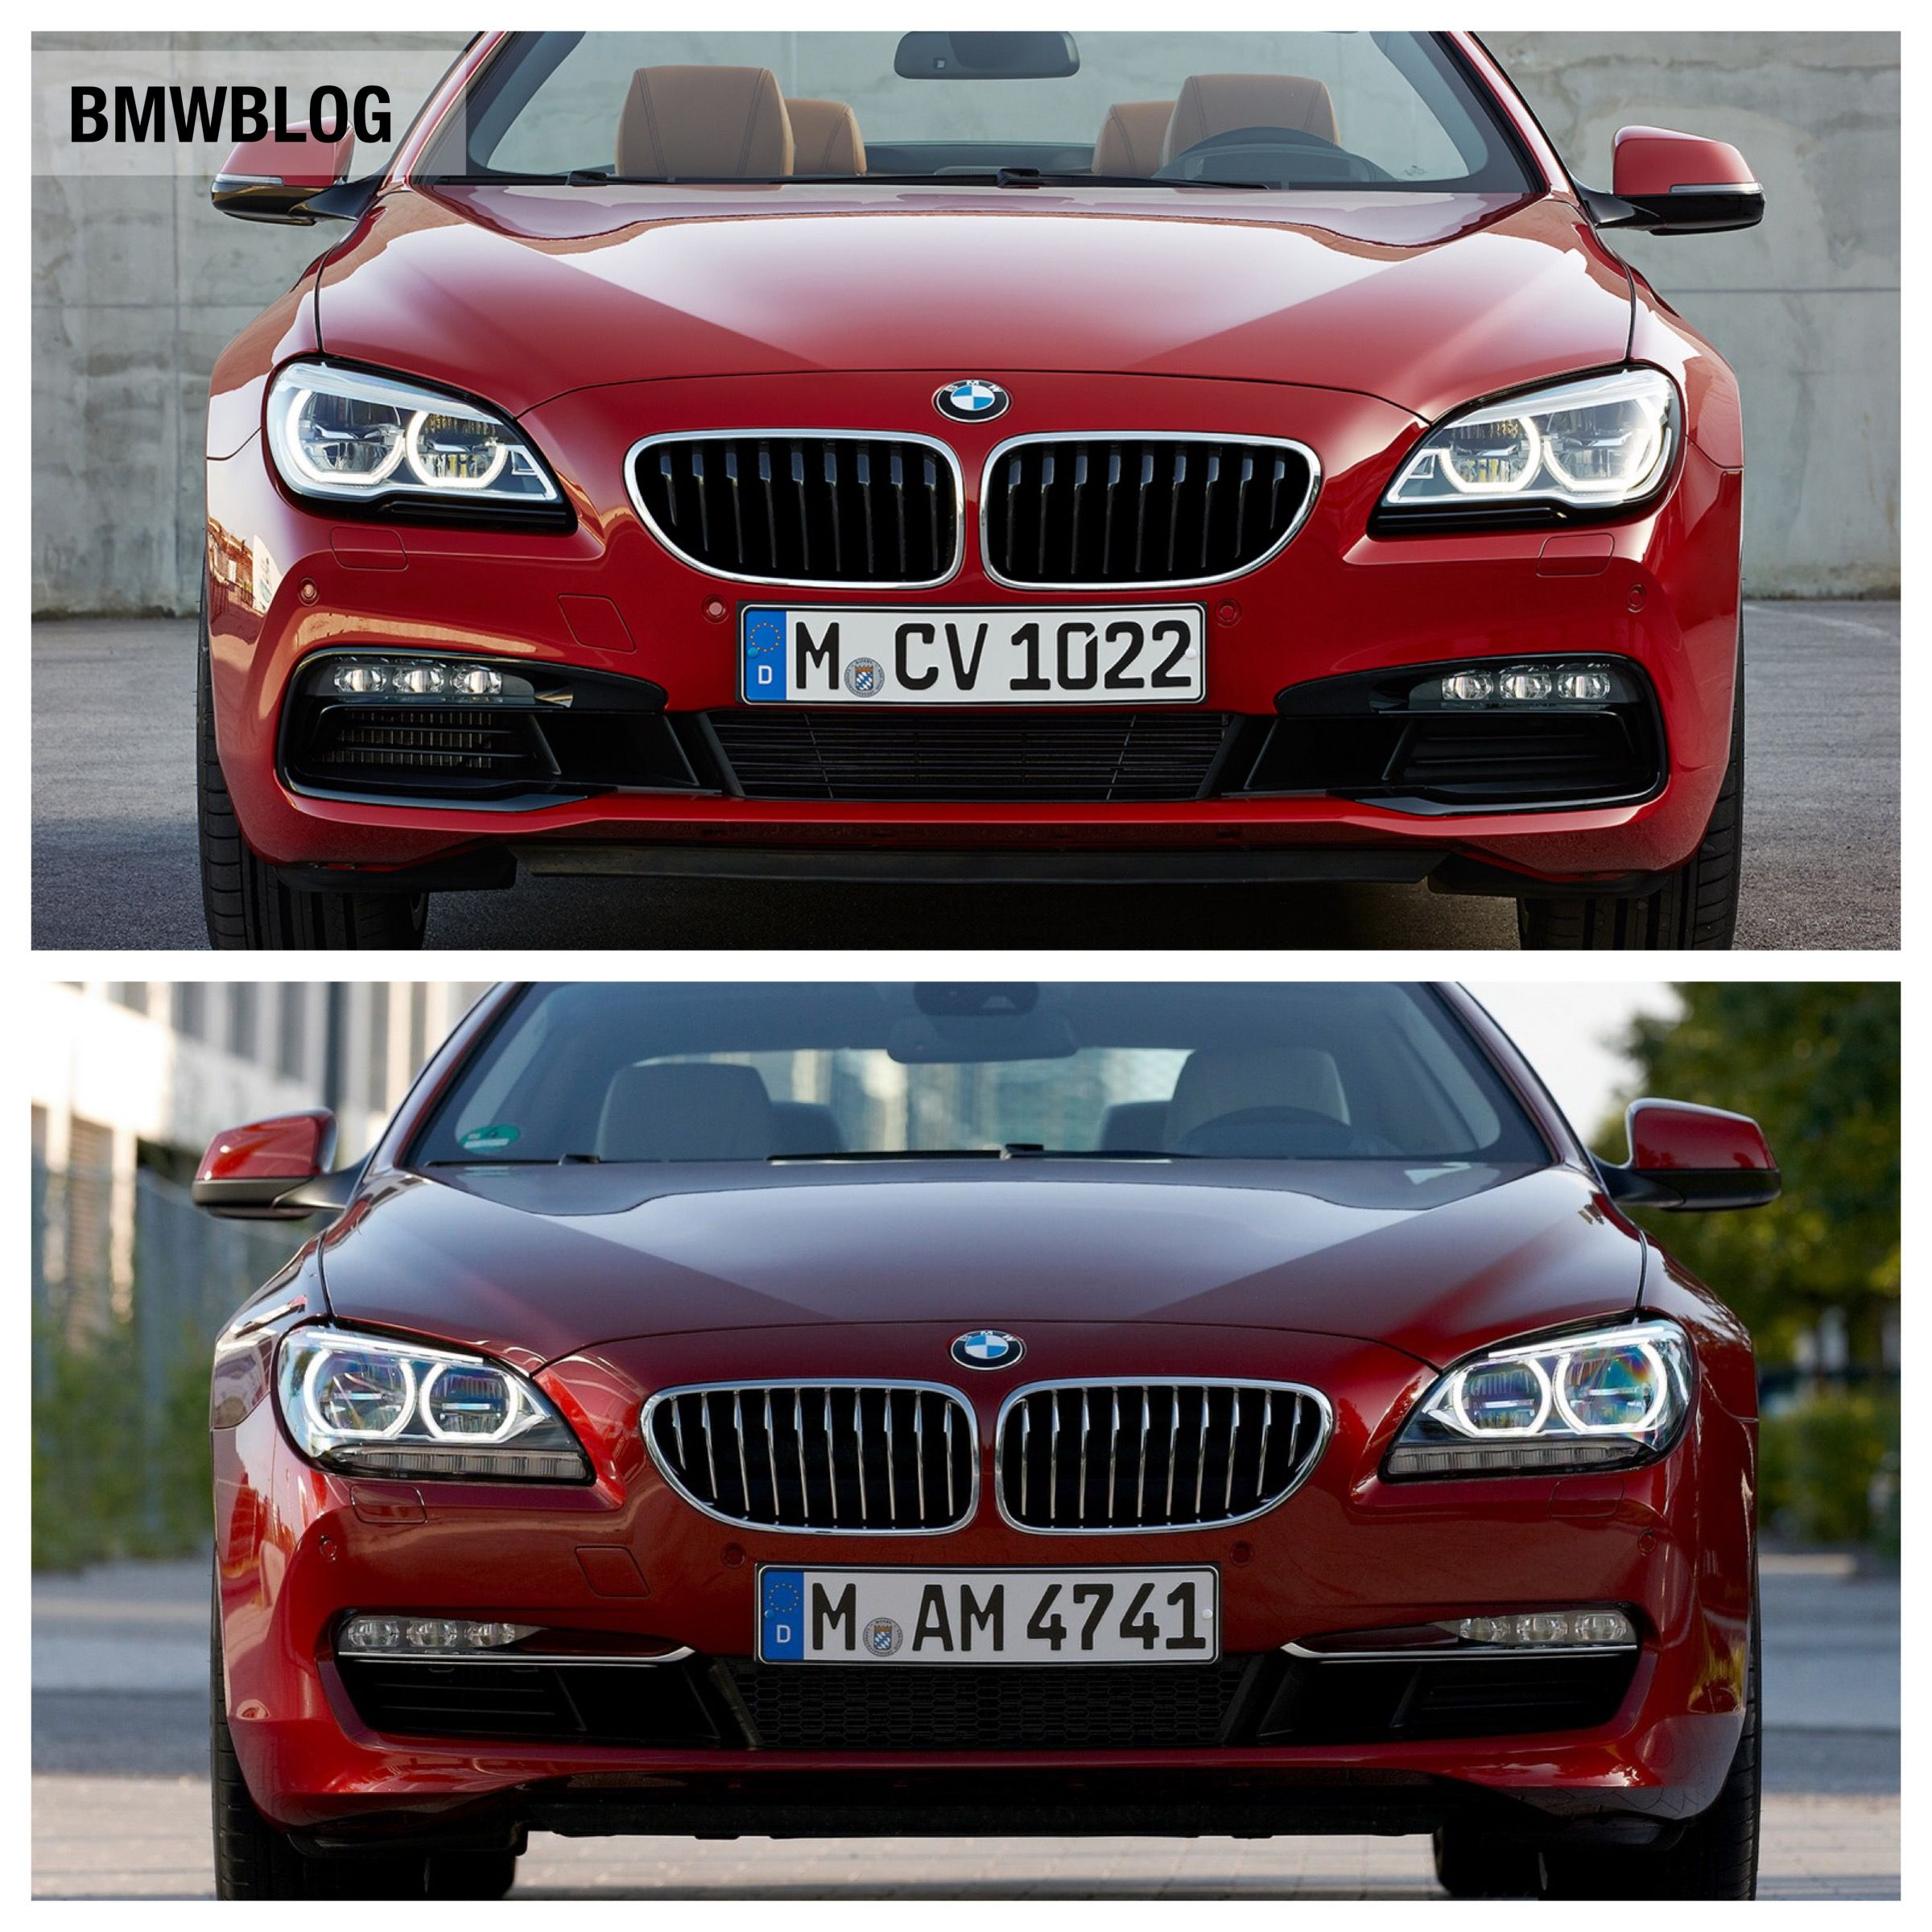 Img 0399 750x750 photo comparison 2012 bmw 6 series vs 2015 bmw 6 series